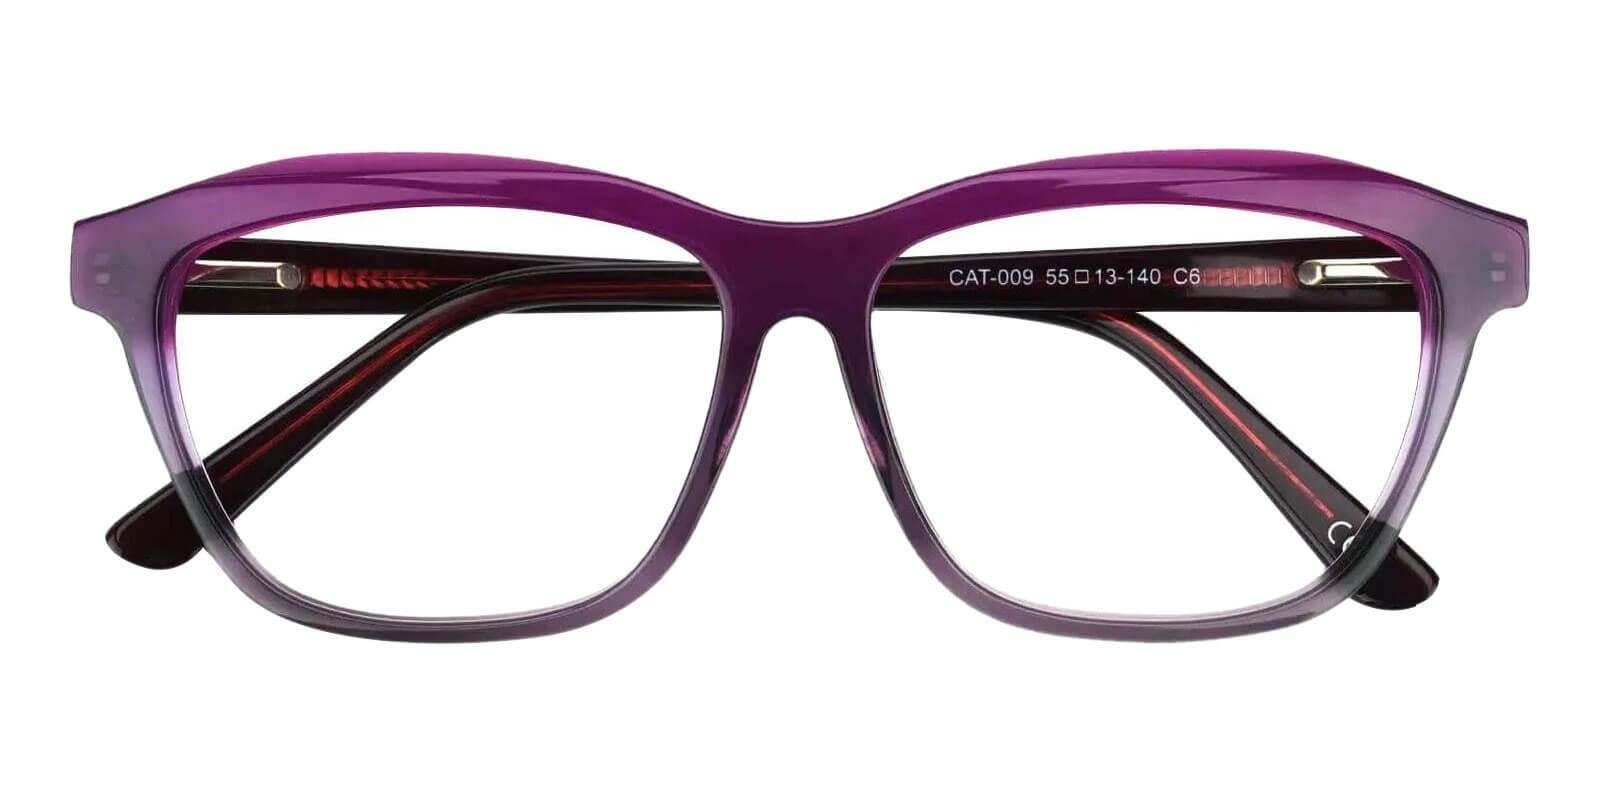 Sonia Purple Acetate Eyeglasses , SpringHinges , UniversalBridgeFit Frames from ABBE Glasses